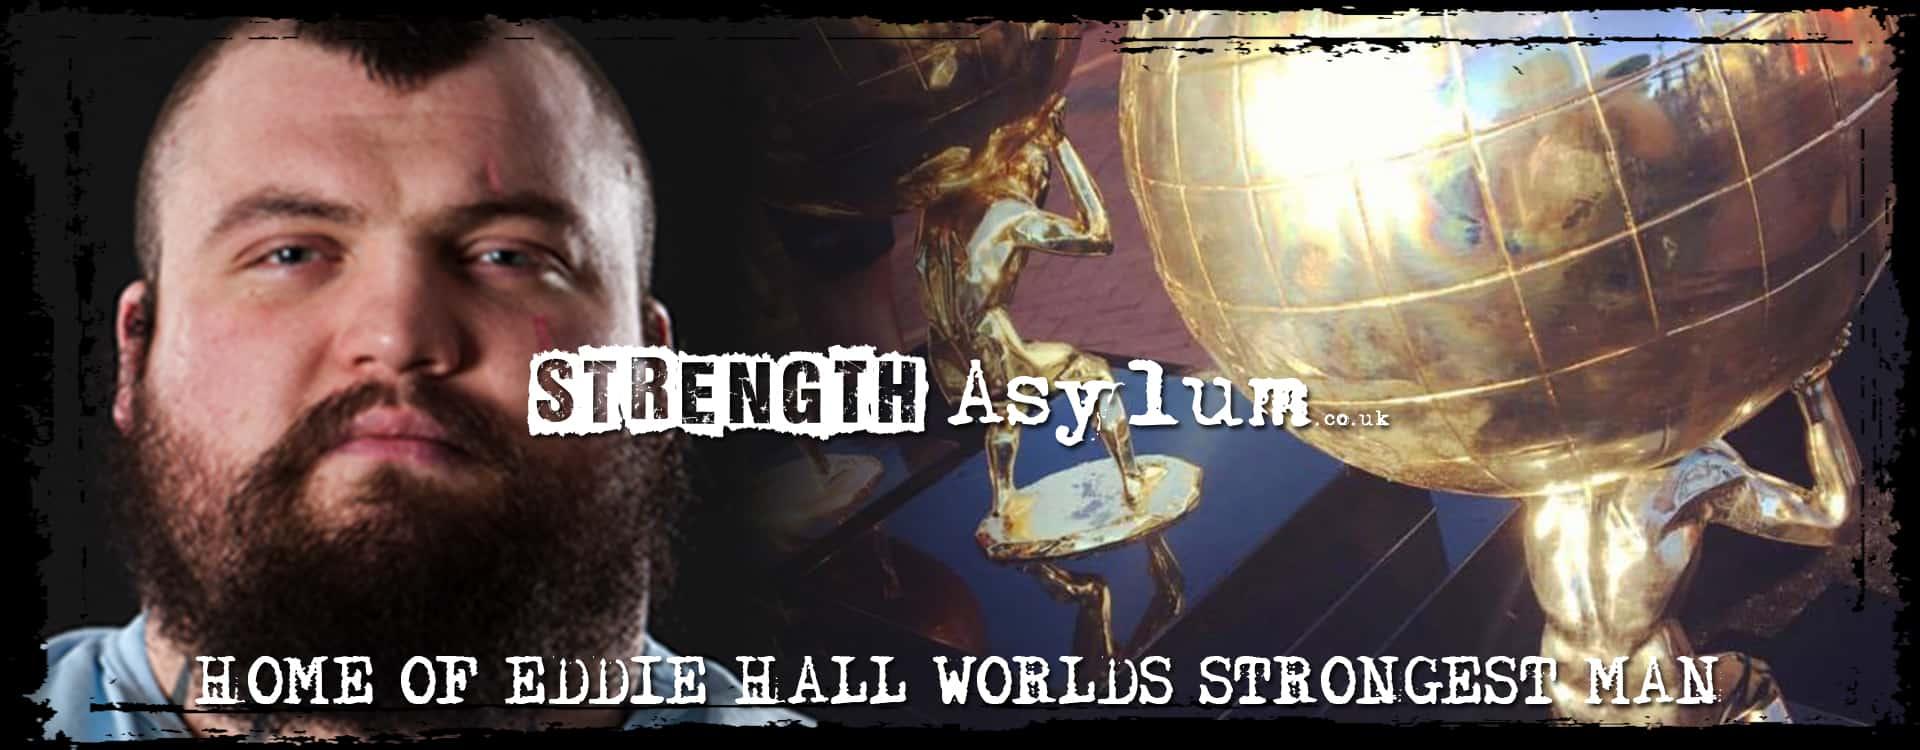 http://www.strengthasylum.co.uk/wp-content/uploads/2017/06/eddie-wsm-2017-banner.jpg